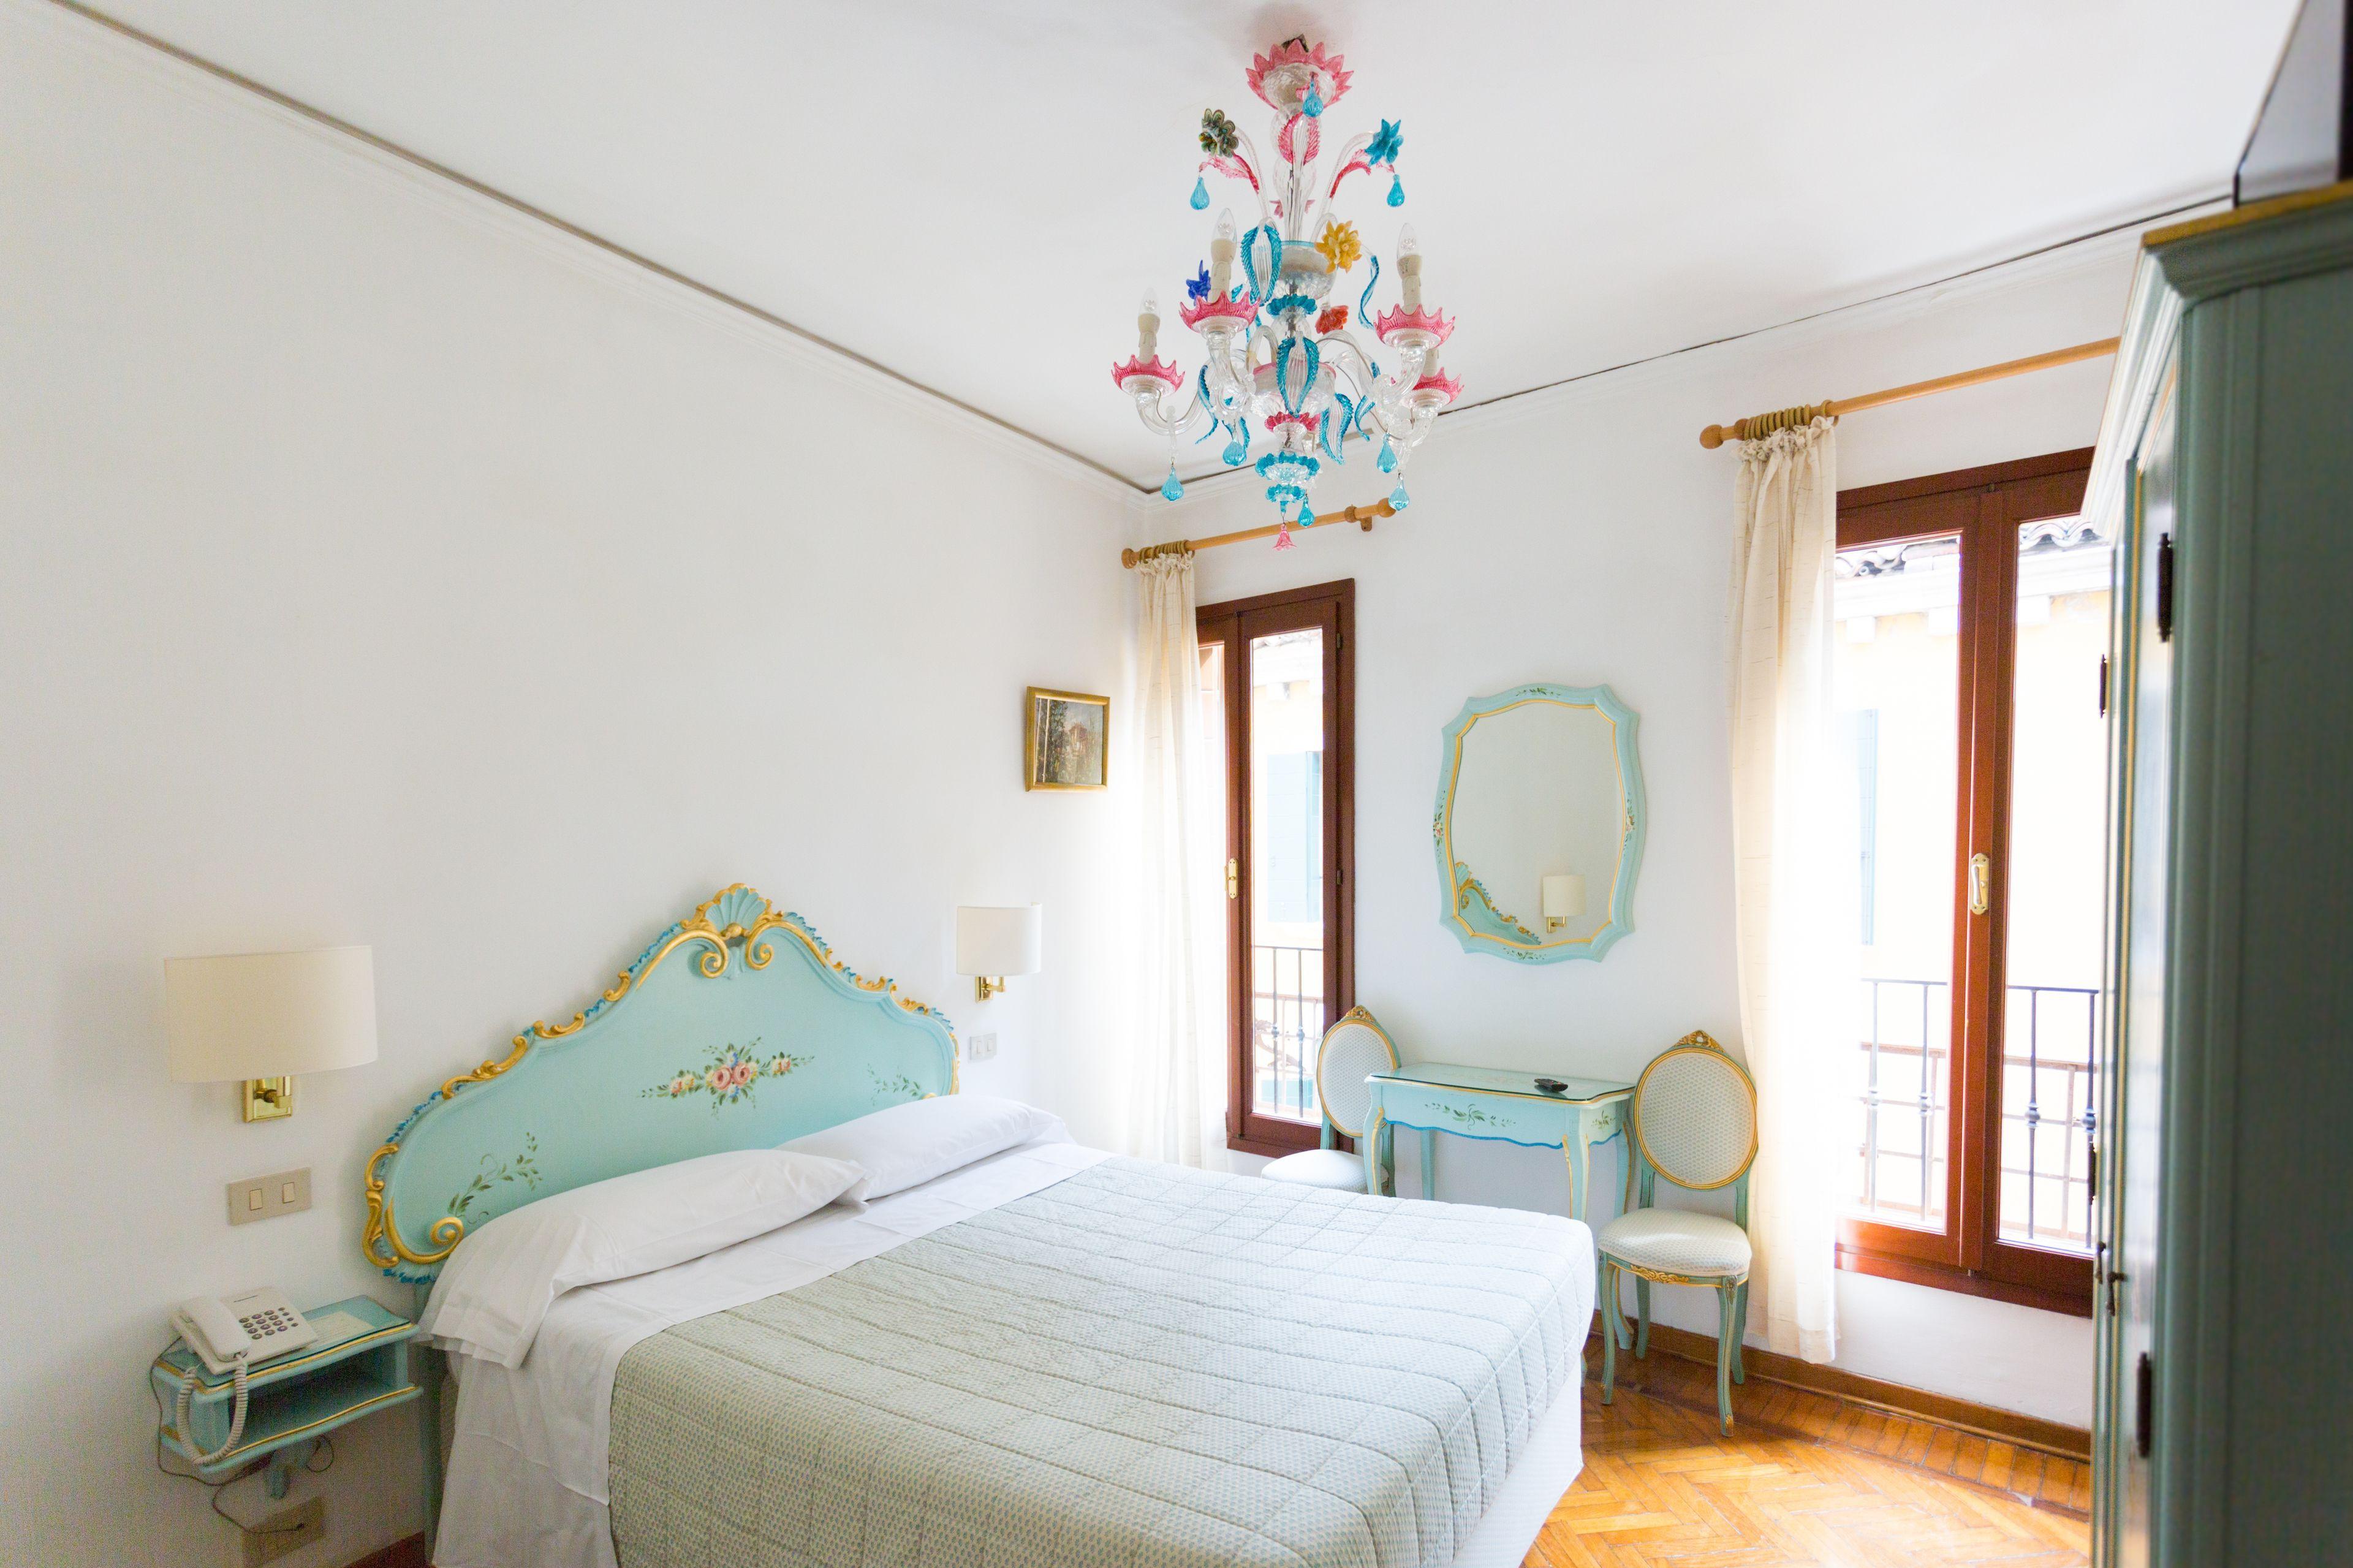 Courtesy of Hotel Serenissima / Expedia